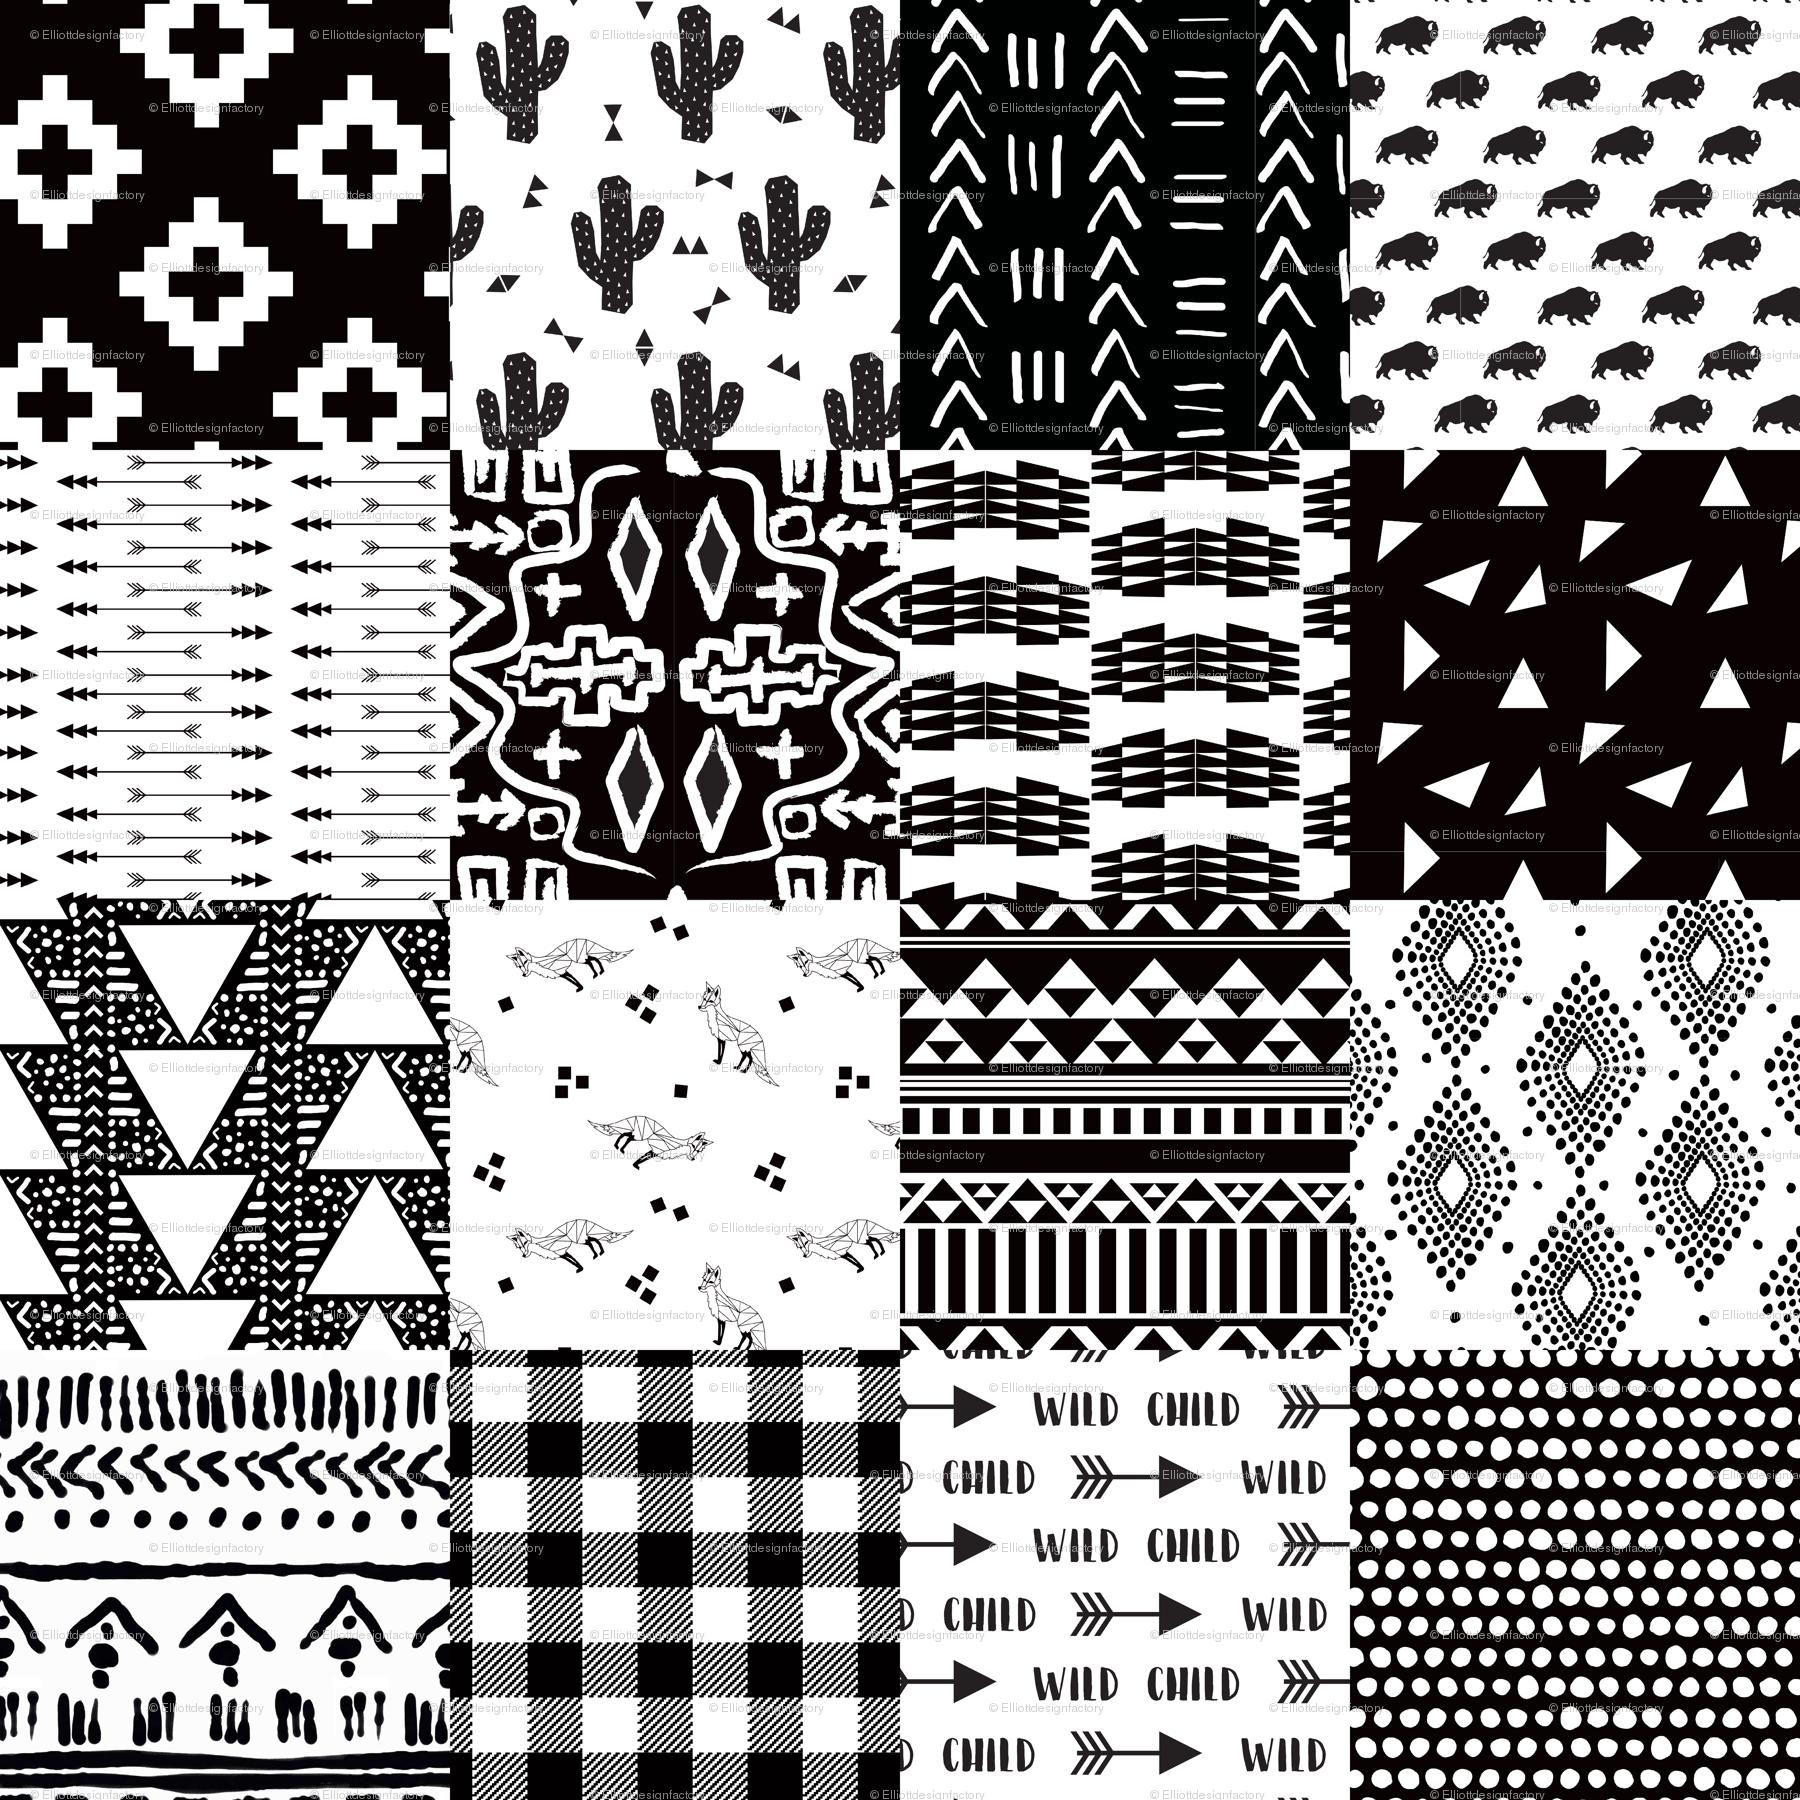 Black white southwestern baby cheater quilt fabric elliottdesignfactory spoonflower